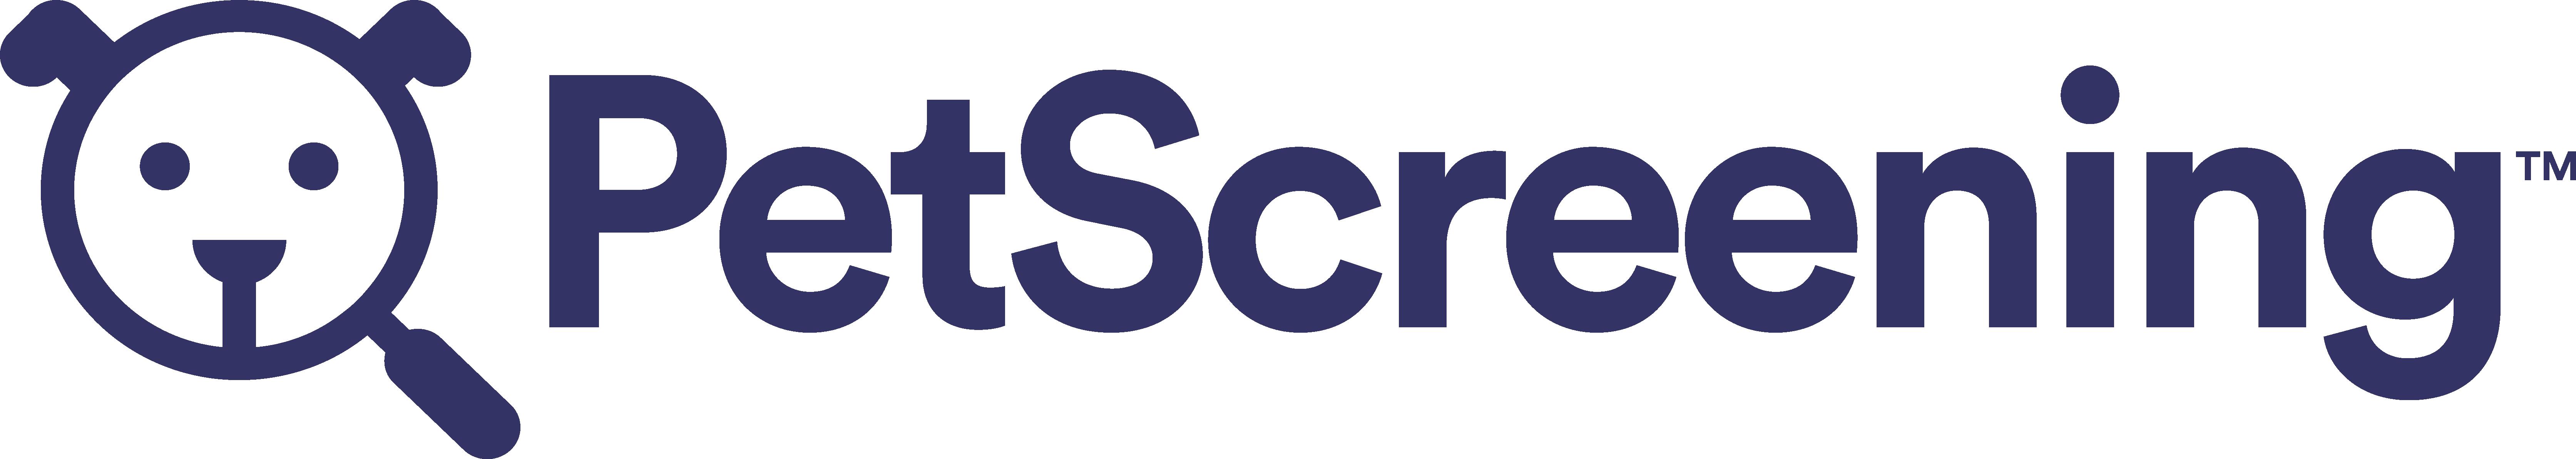 petscreening_logo_navy_new